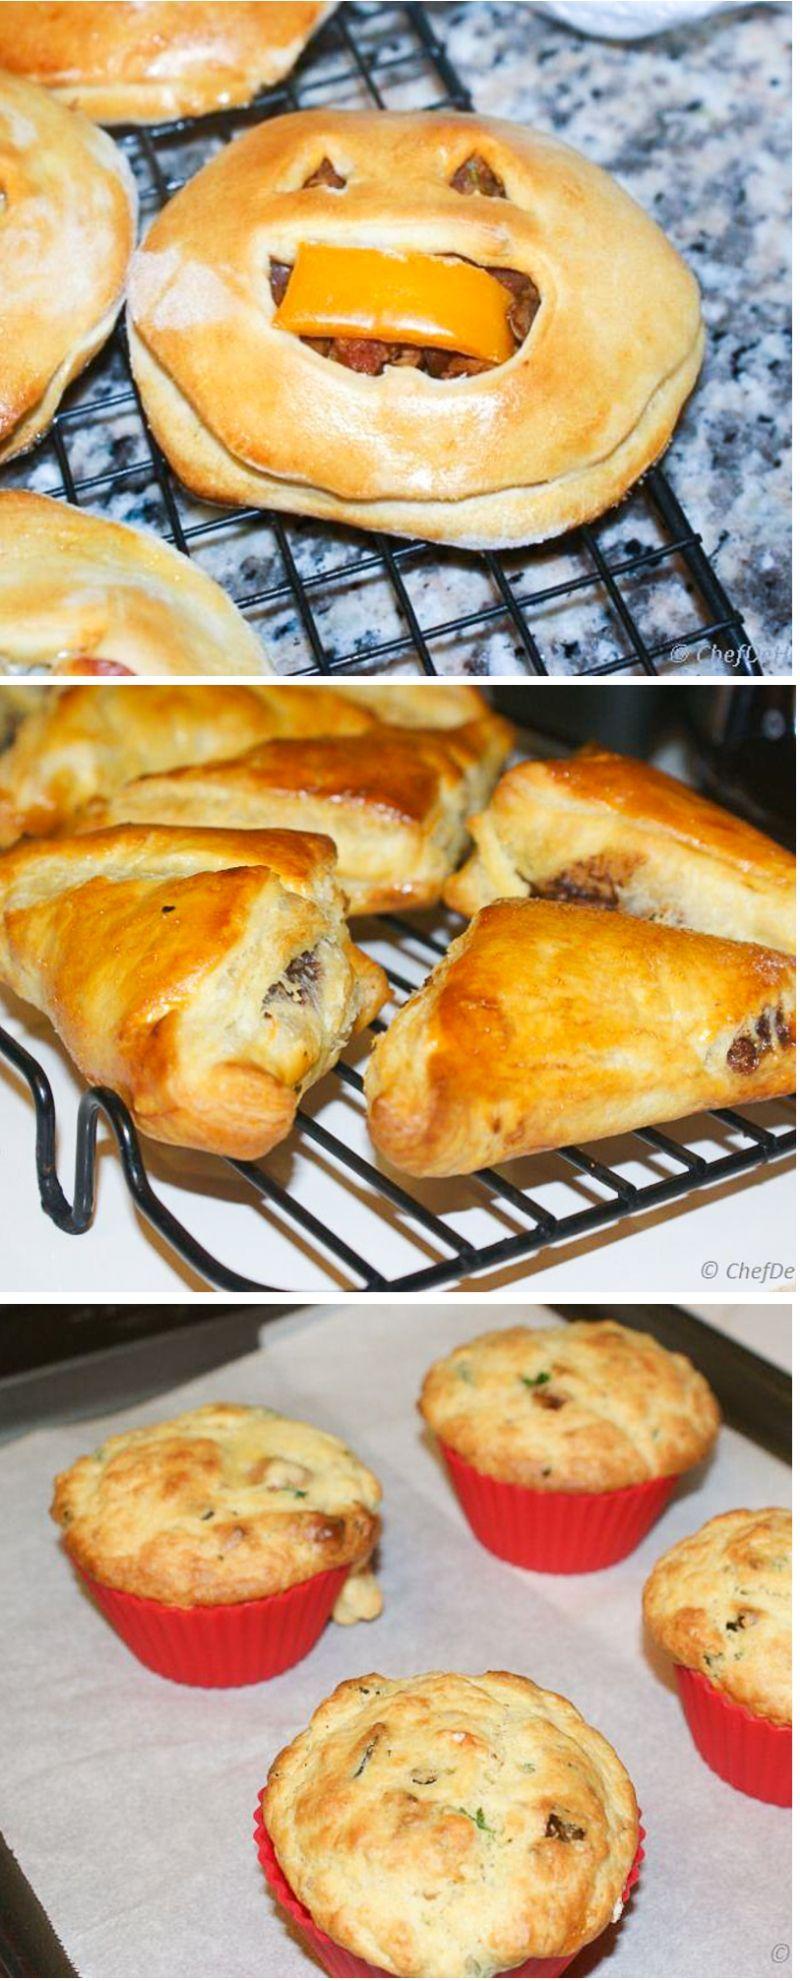 savory bake ideas bake meals and ideas bake ideas